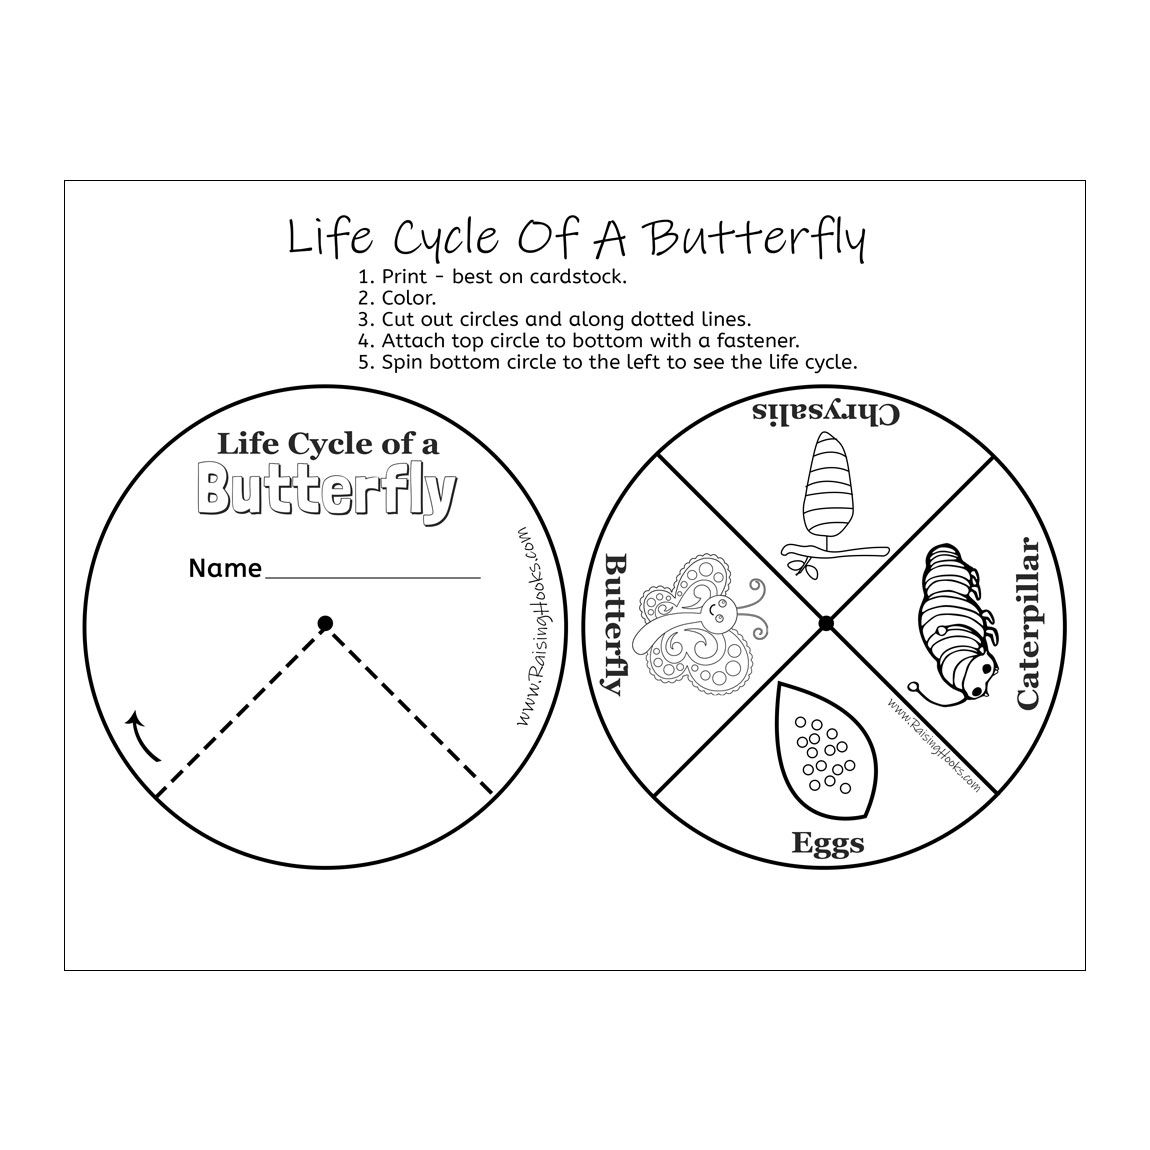 Predownload: Life Cycle Of A Butterfly Wheel Raising Hooks Life Cycles Butterfly Life Cycle Activity Ladybug Life Cycle [ 1150 x 1150 Pixel ]